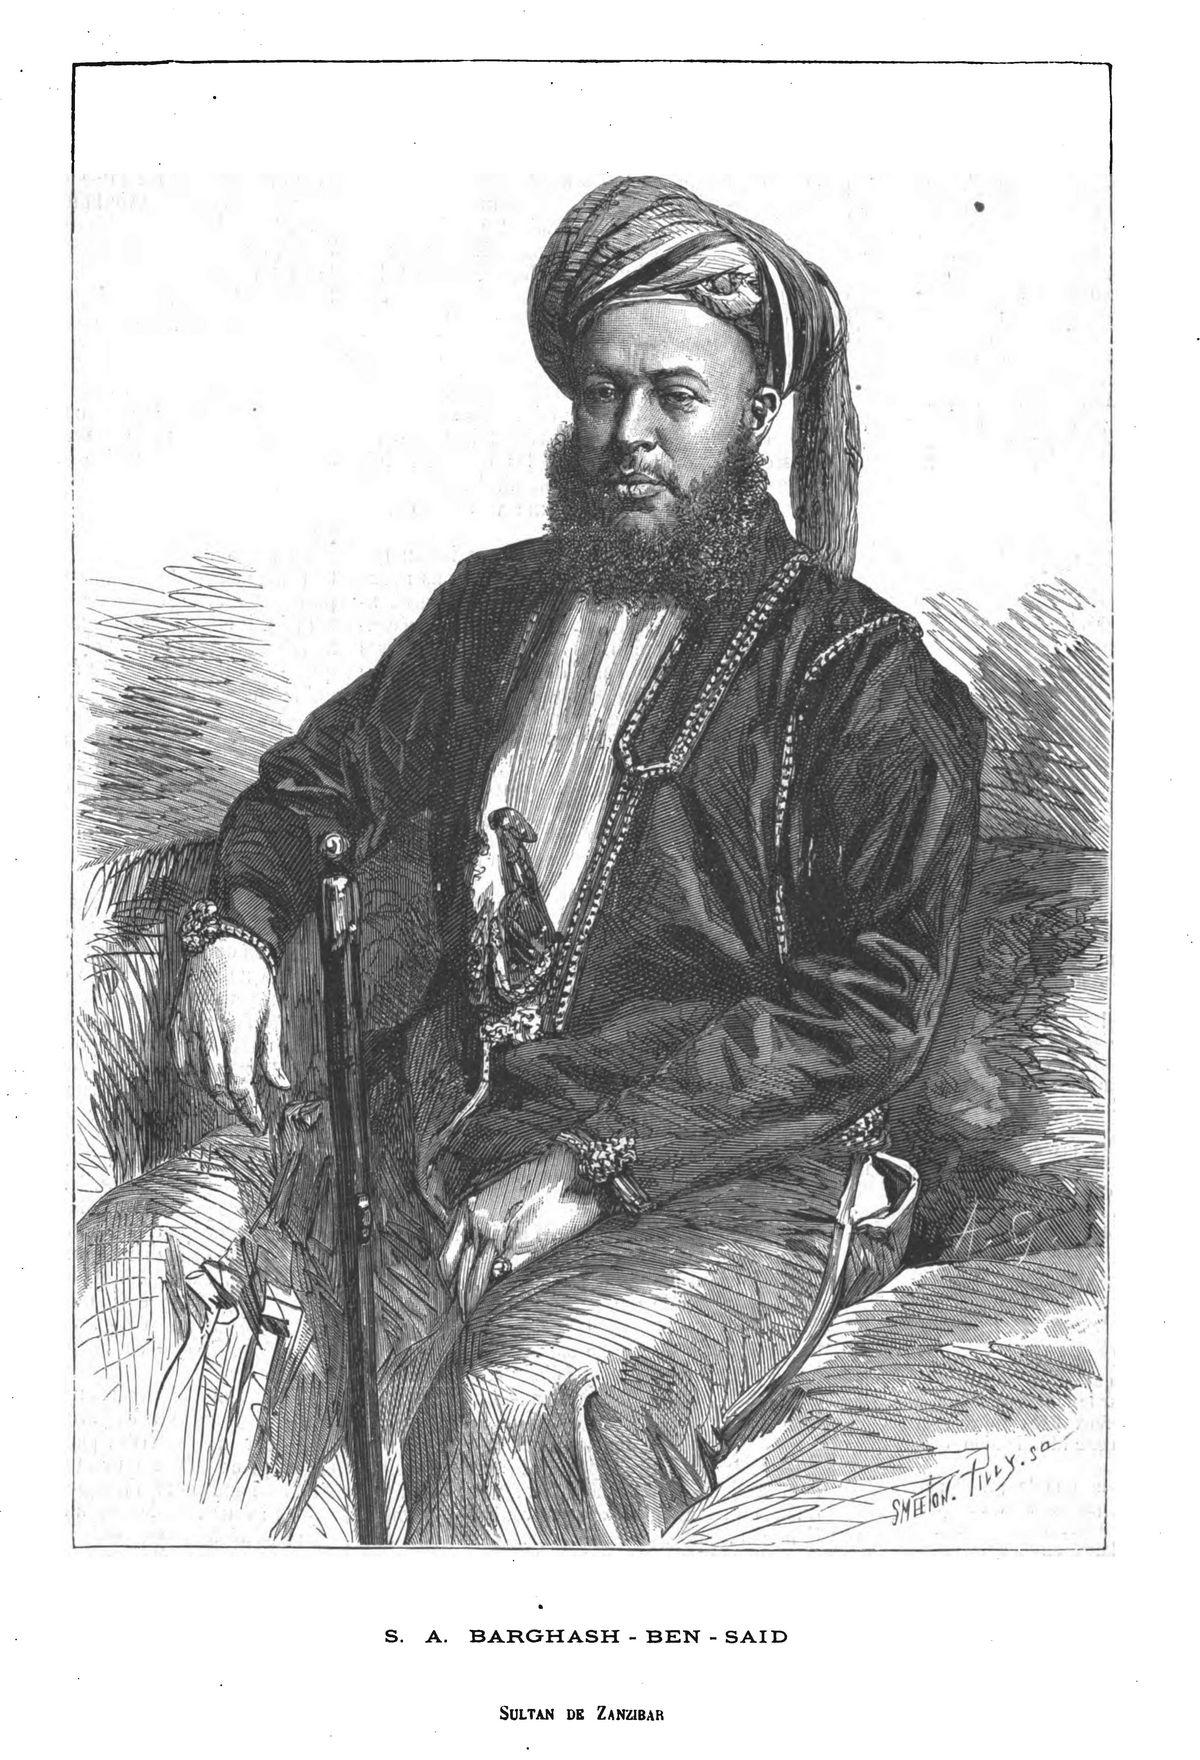 S. A. Barghash-ben-Saïd, sultan de Zanzibar. 1875